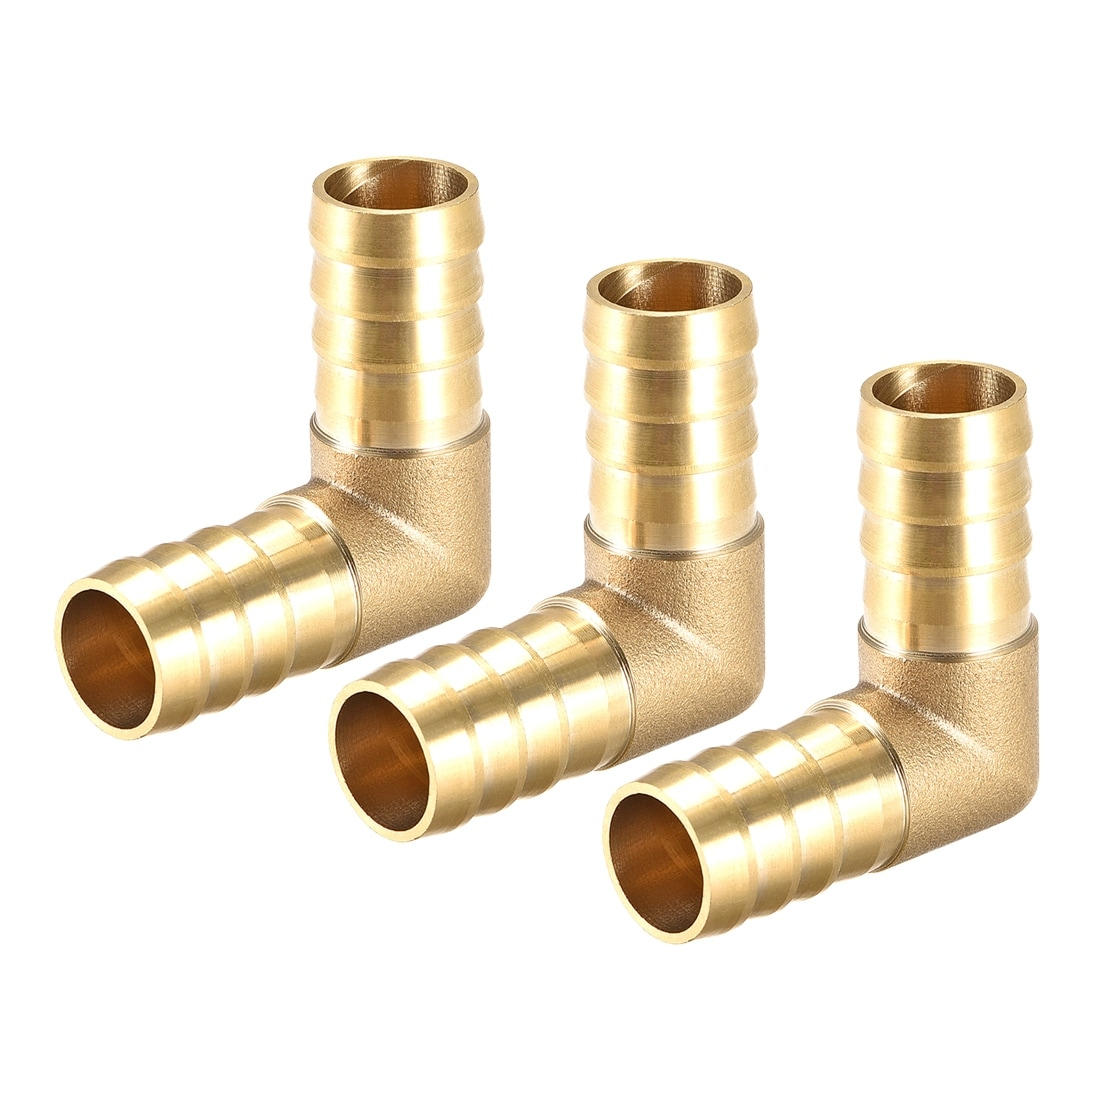 Beta Tools 410 HSS Twist Drill Bit Cylindrical Shank Rolled 6.75mm004100109